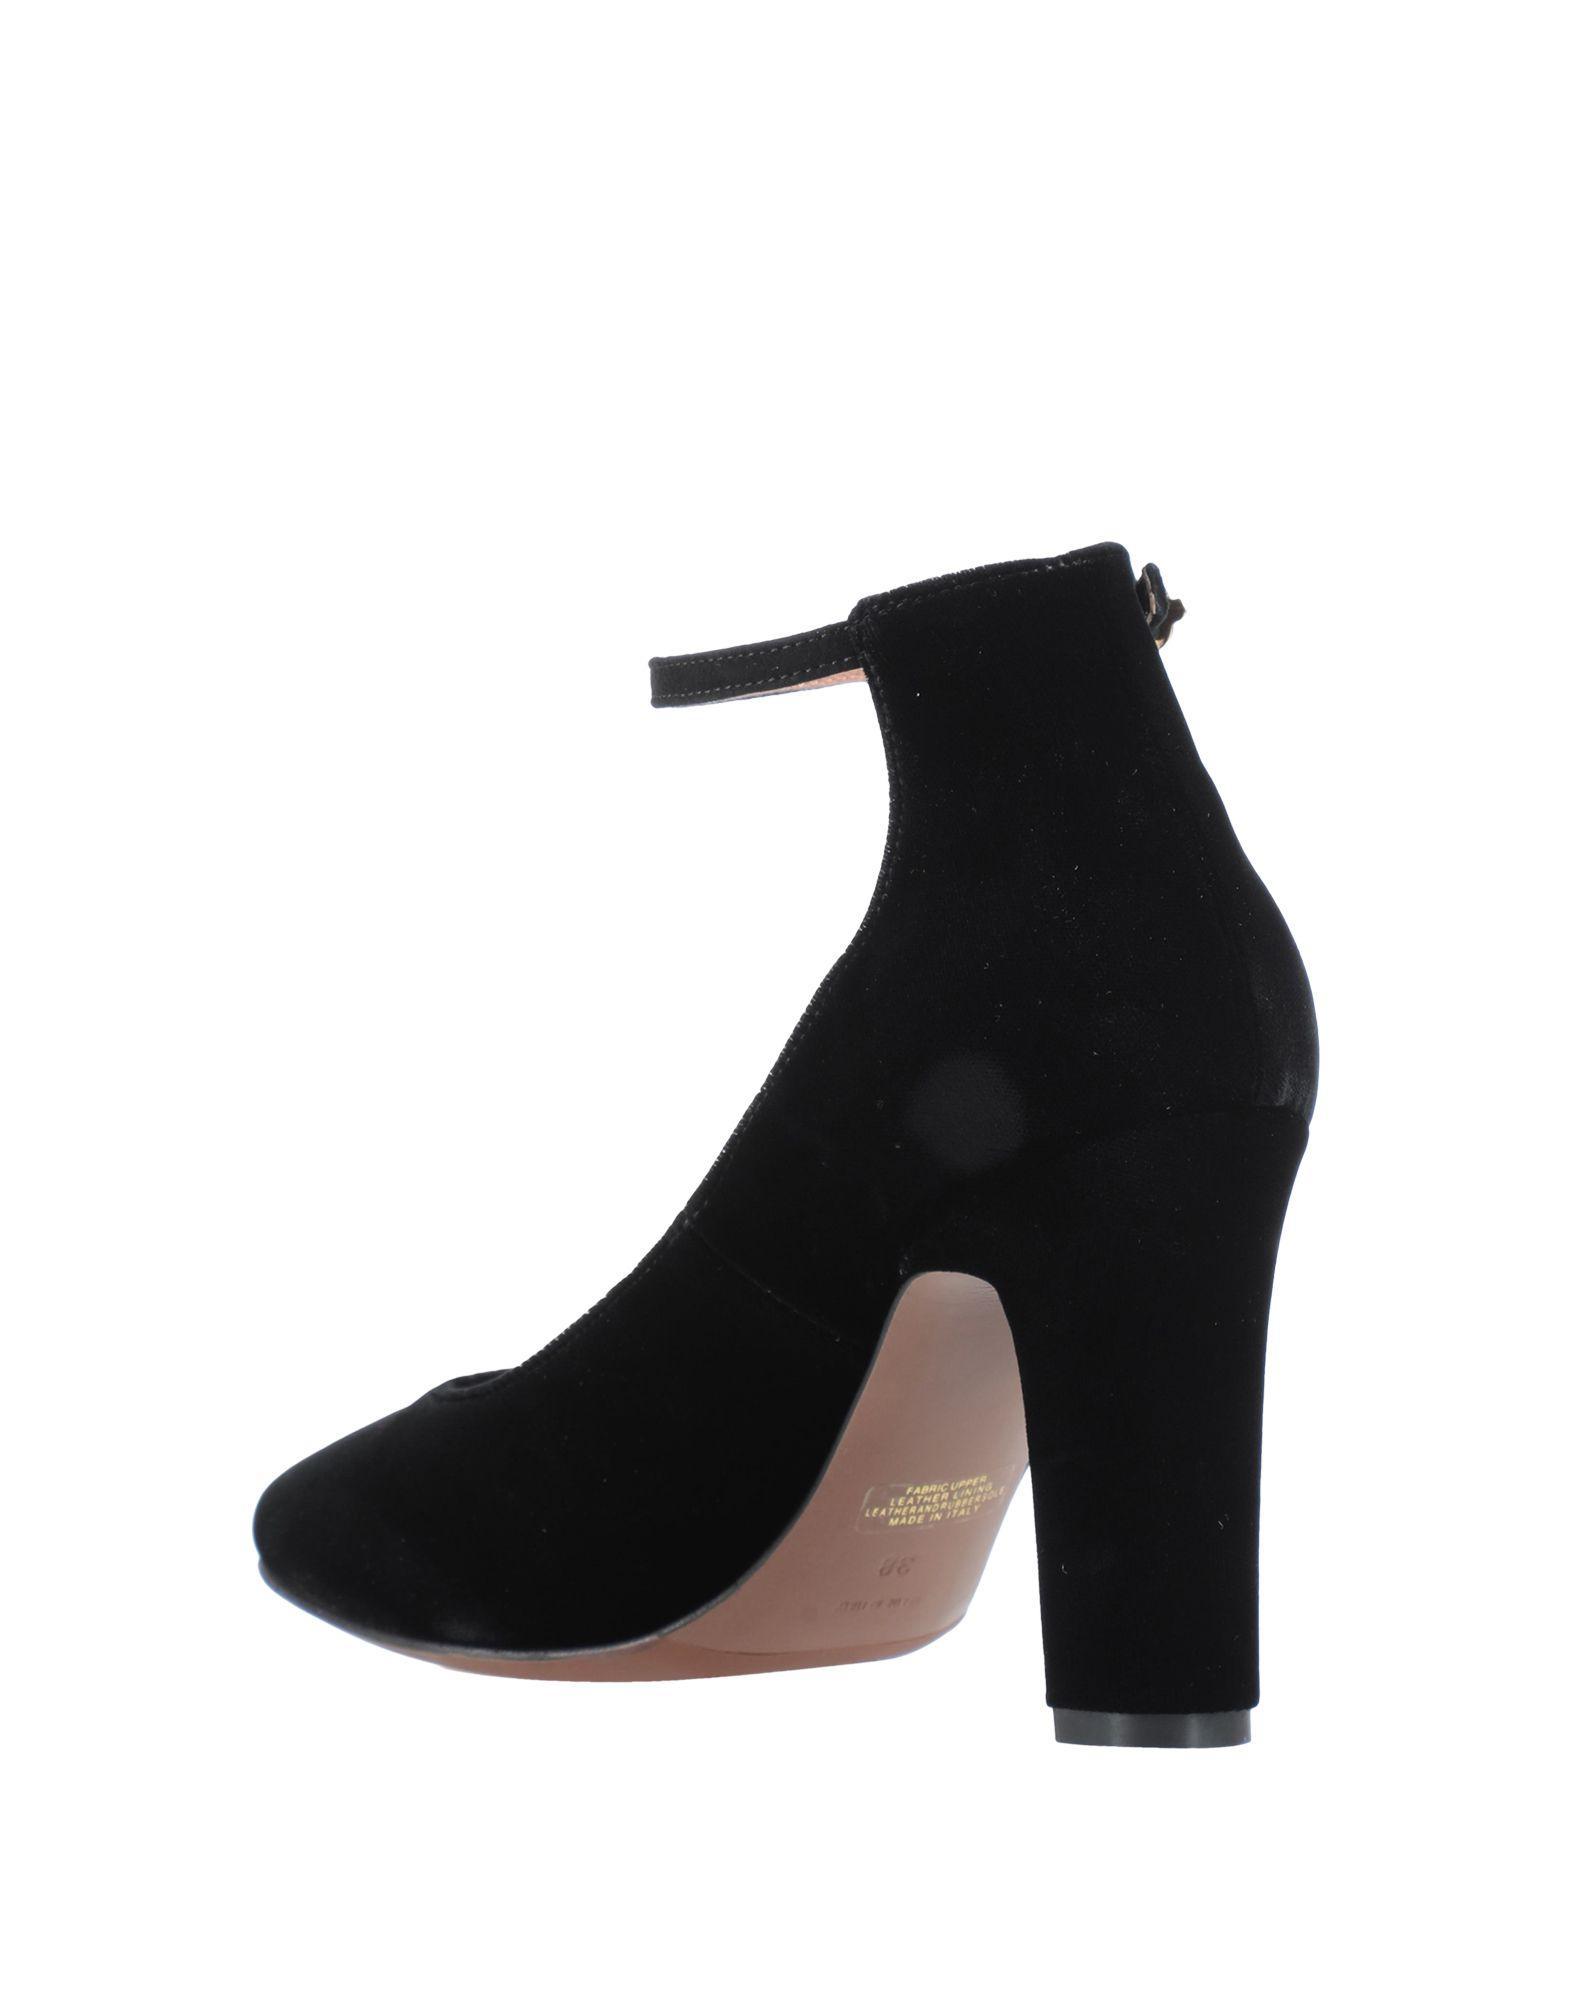 Zapatos de salón L'Autre Chose de Terciopelo de color Negro